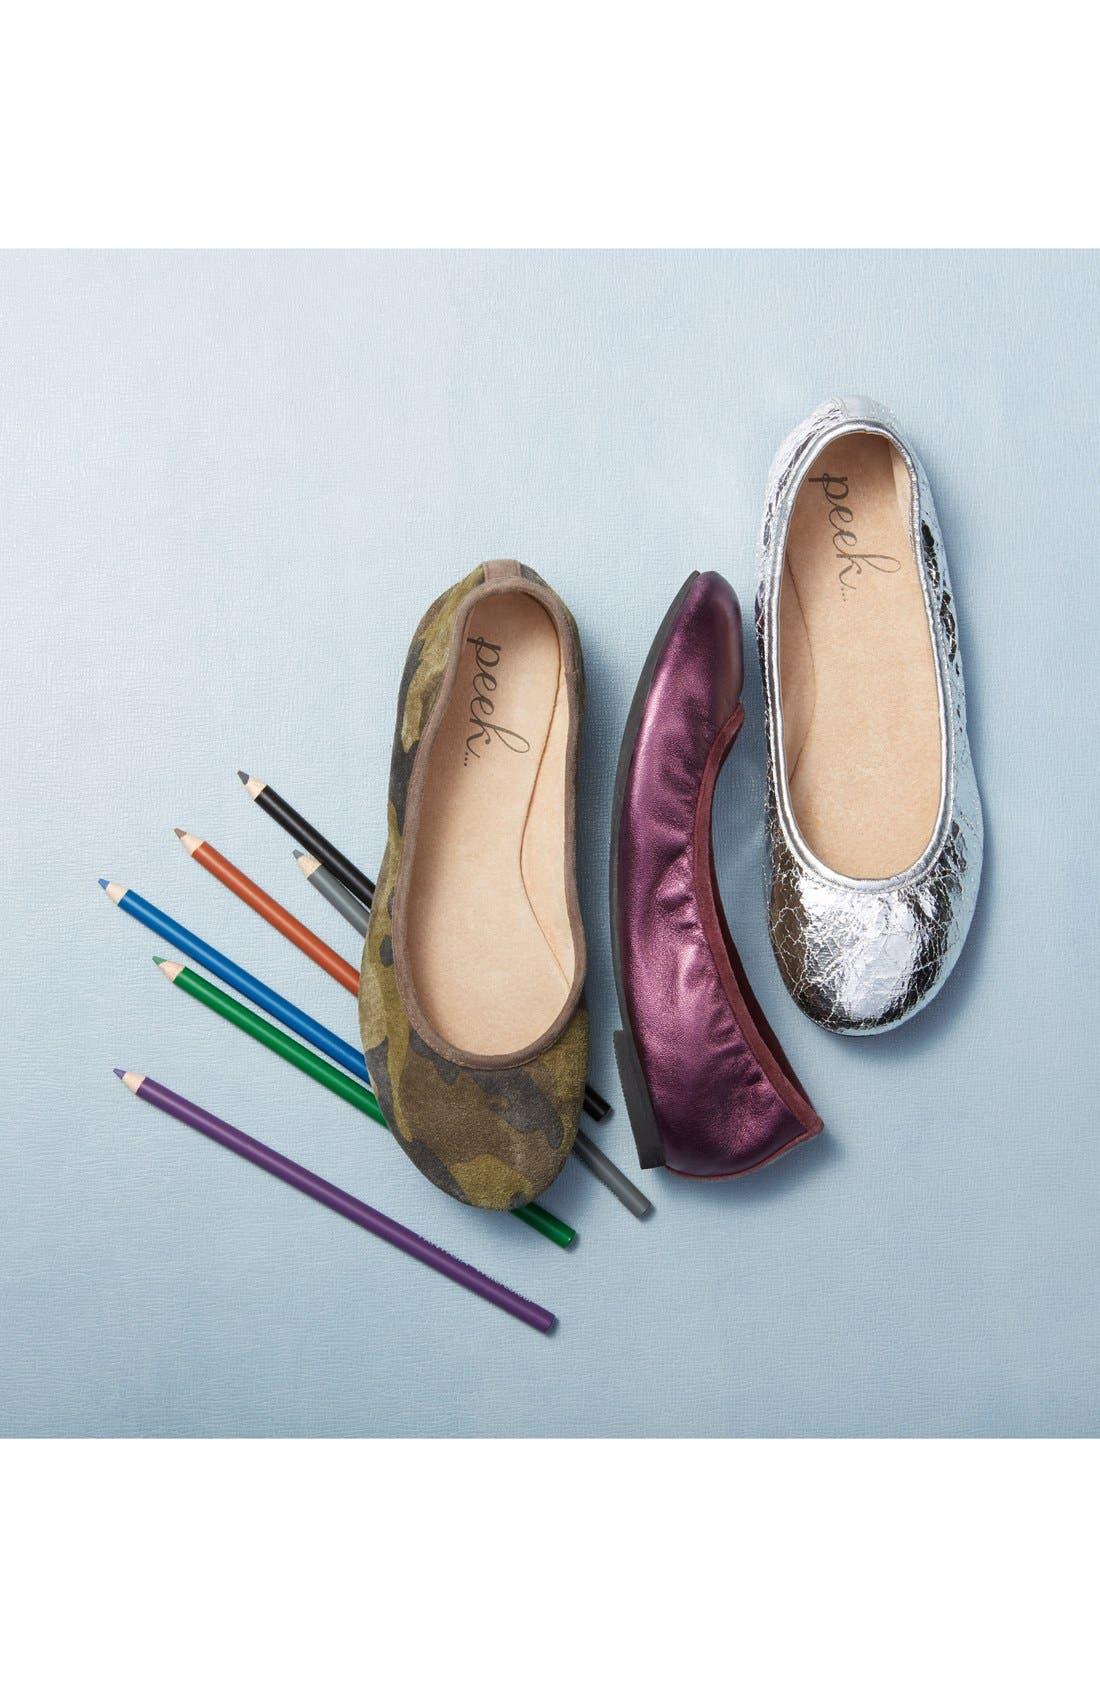 'Dita' Ballet Flat,                             Alternate thumbnail 5, color,                             040